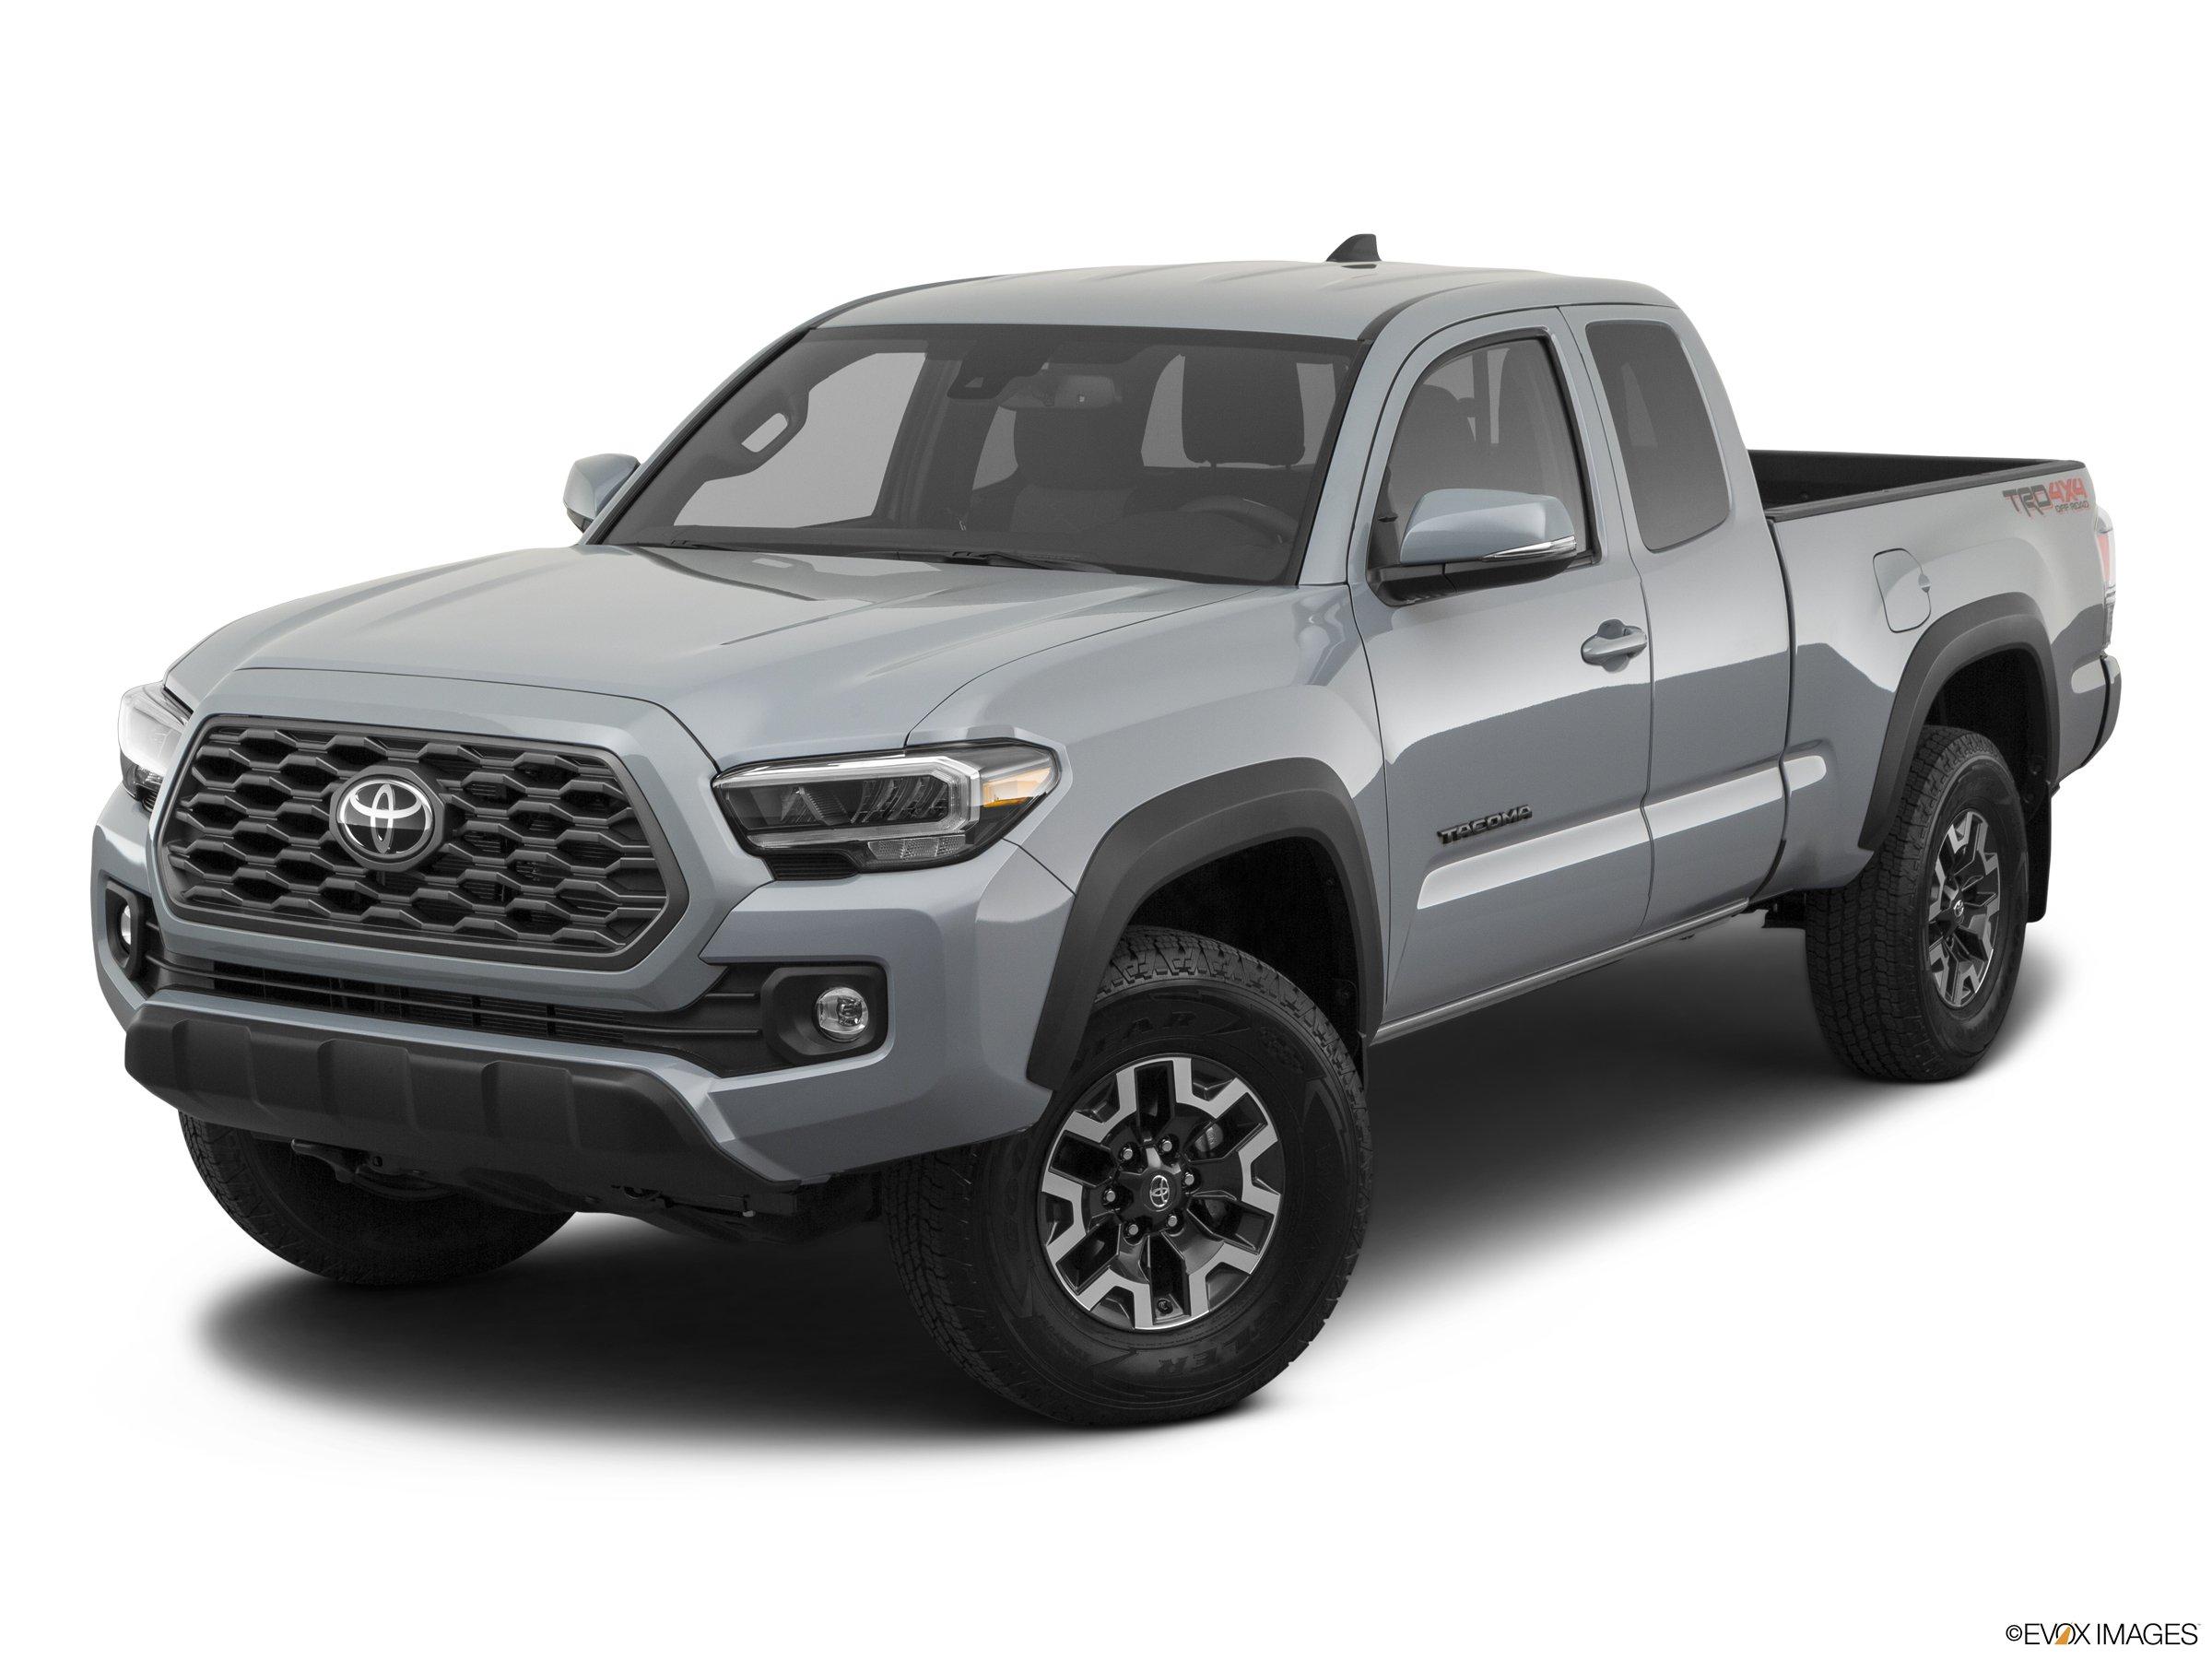 2020 Toyota Tacoma TRD Off-Road 4×4 pickup